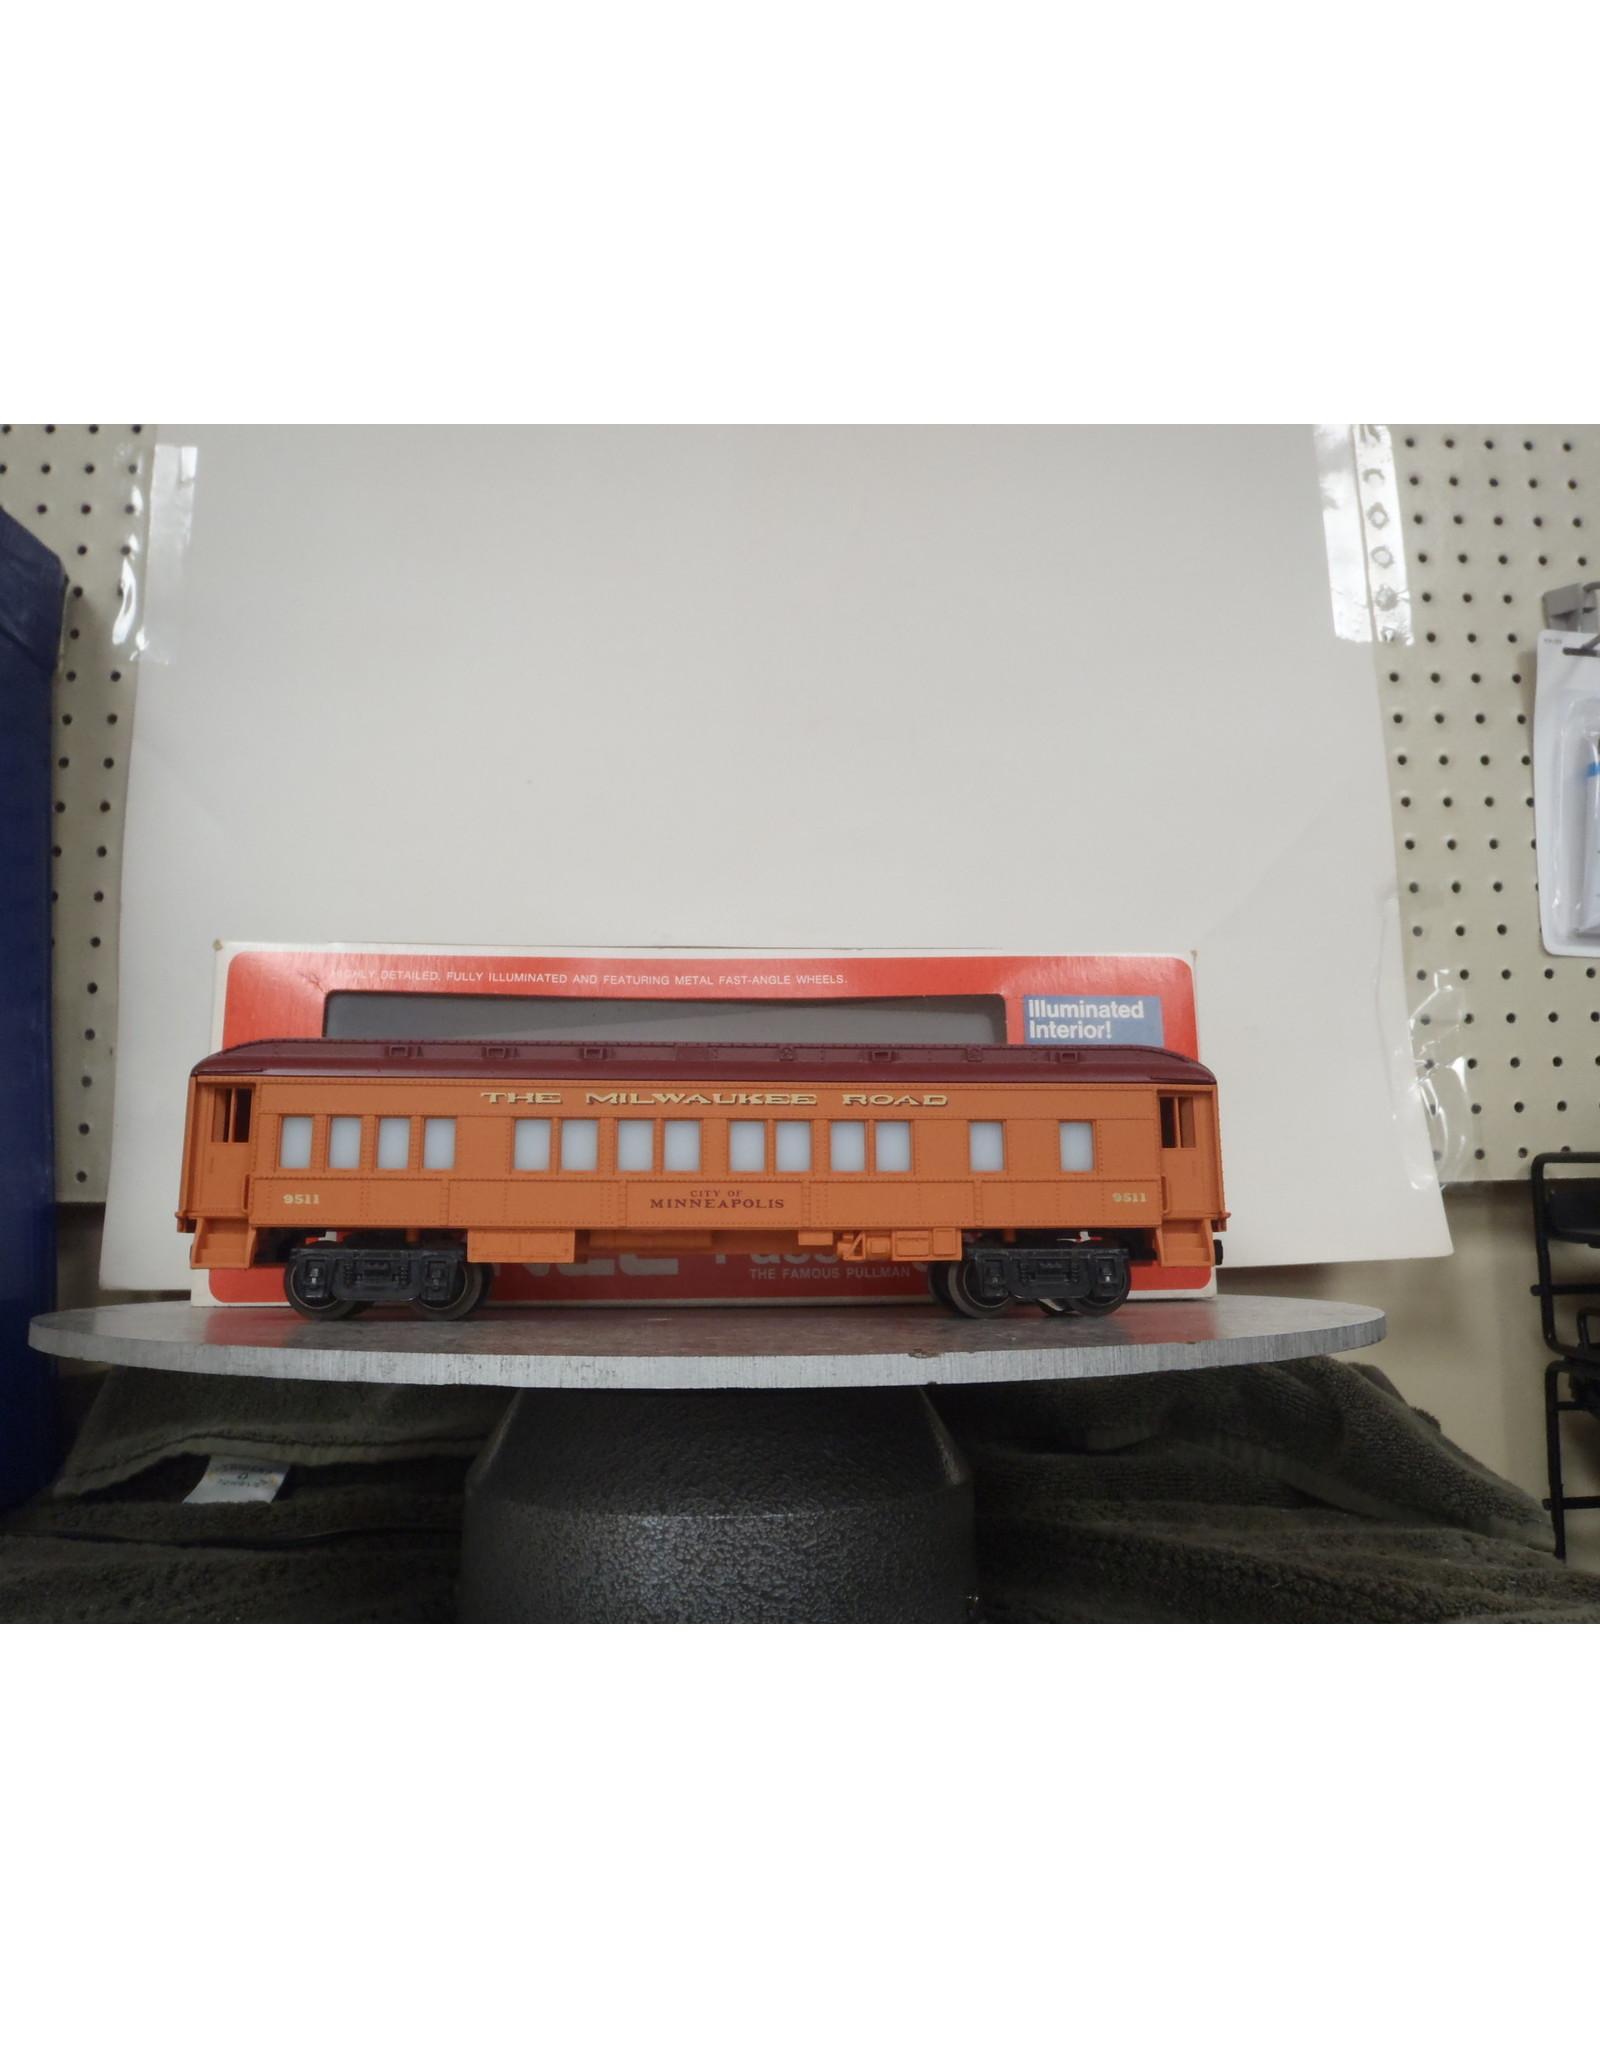 Lionel Passenger Milwaukee Rd Tacoma 9504